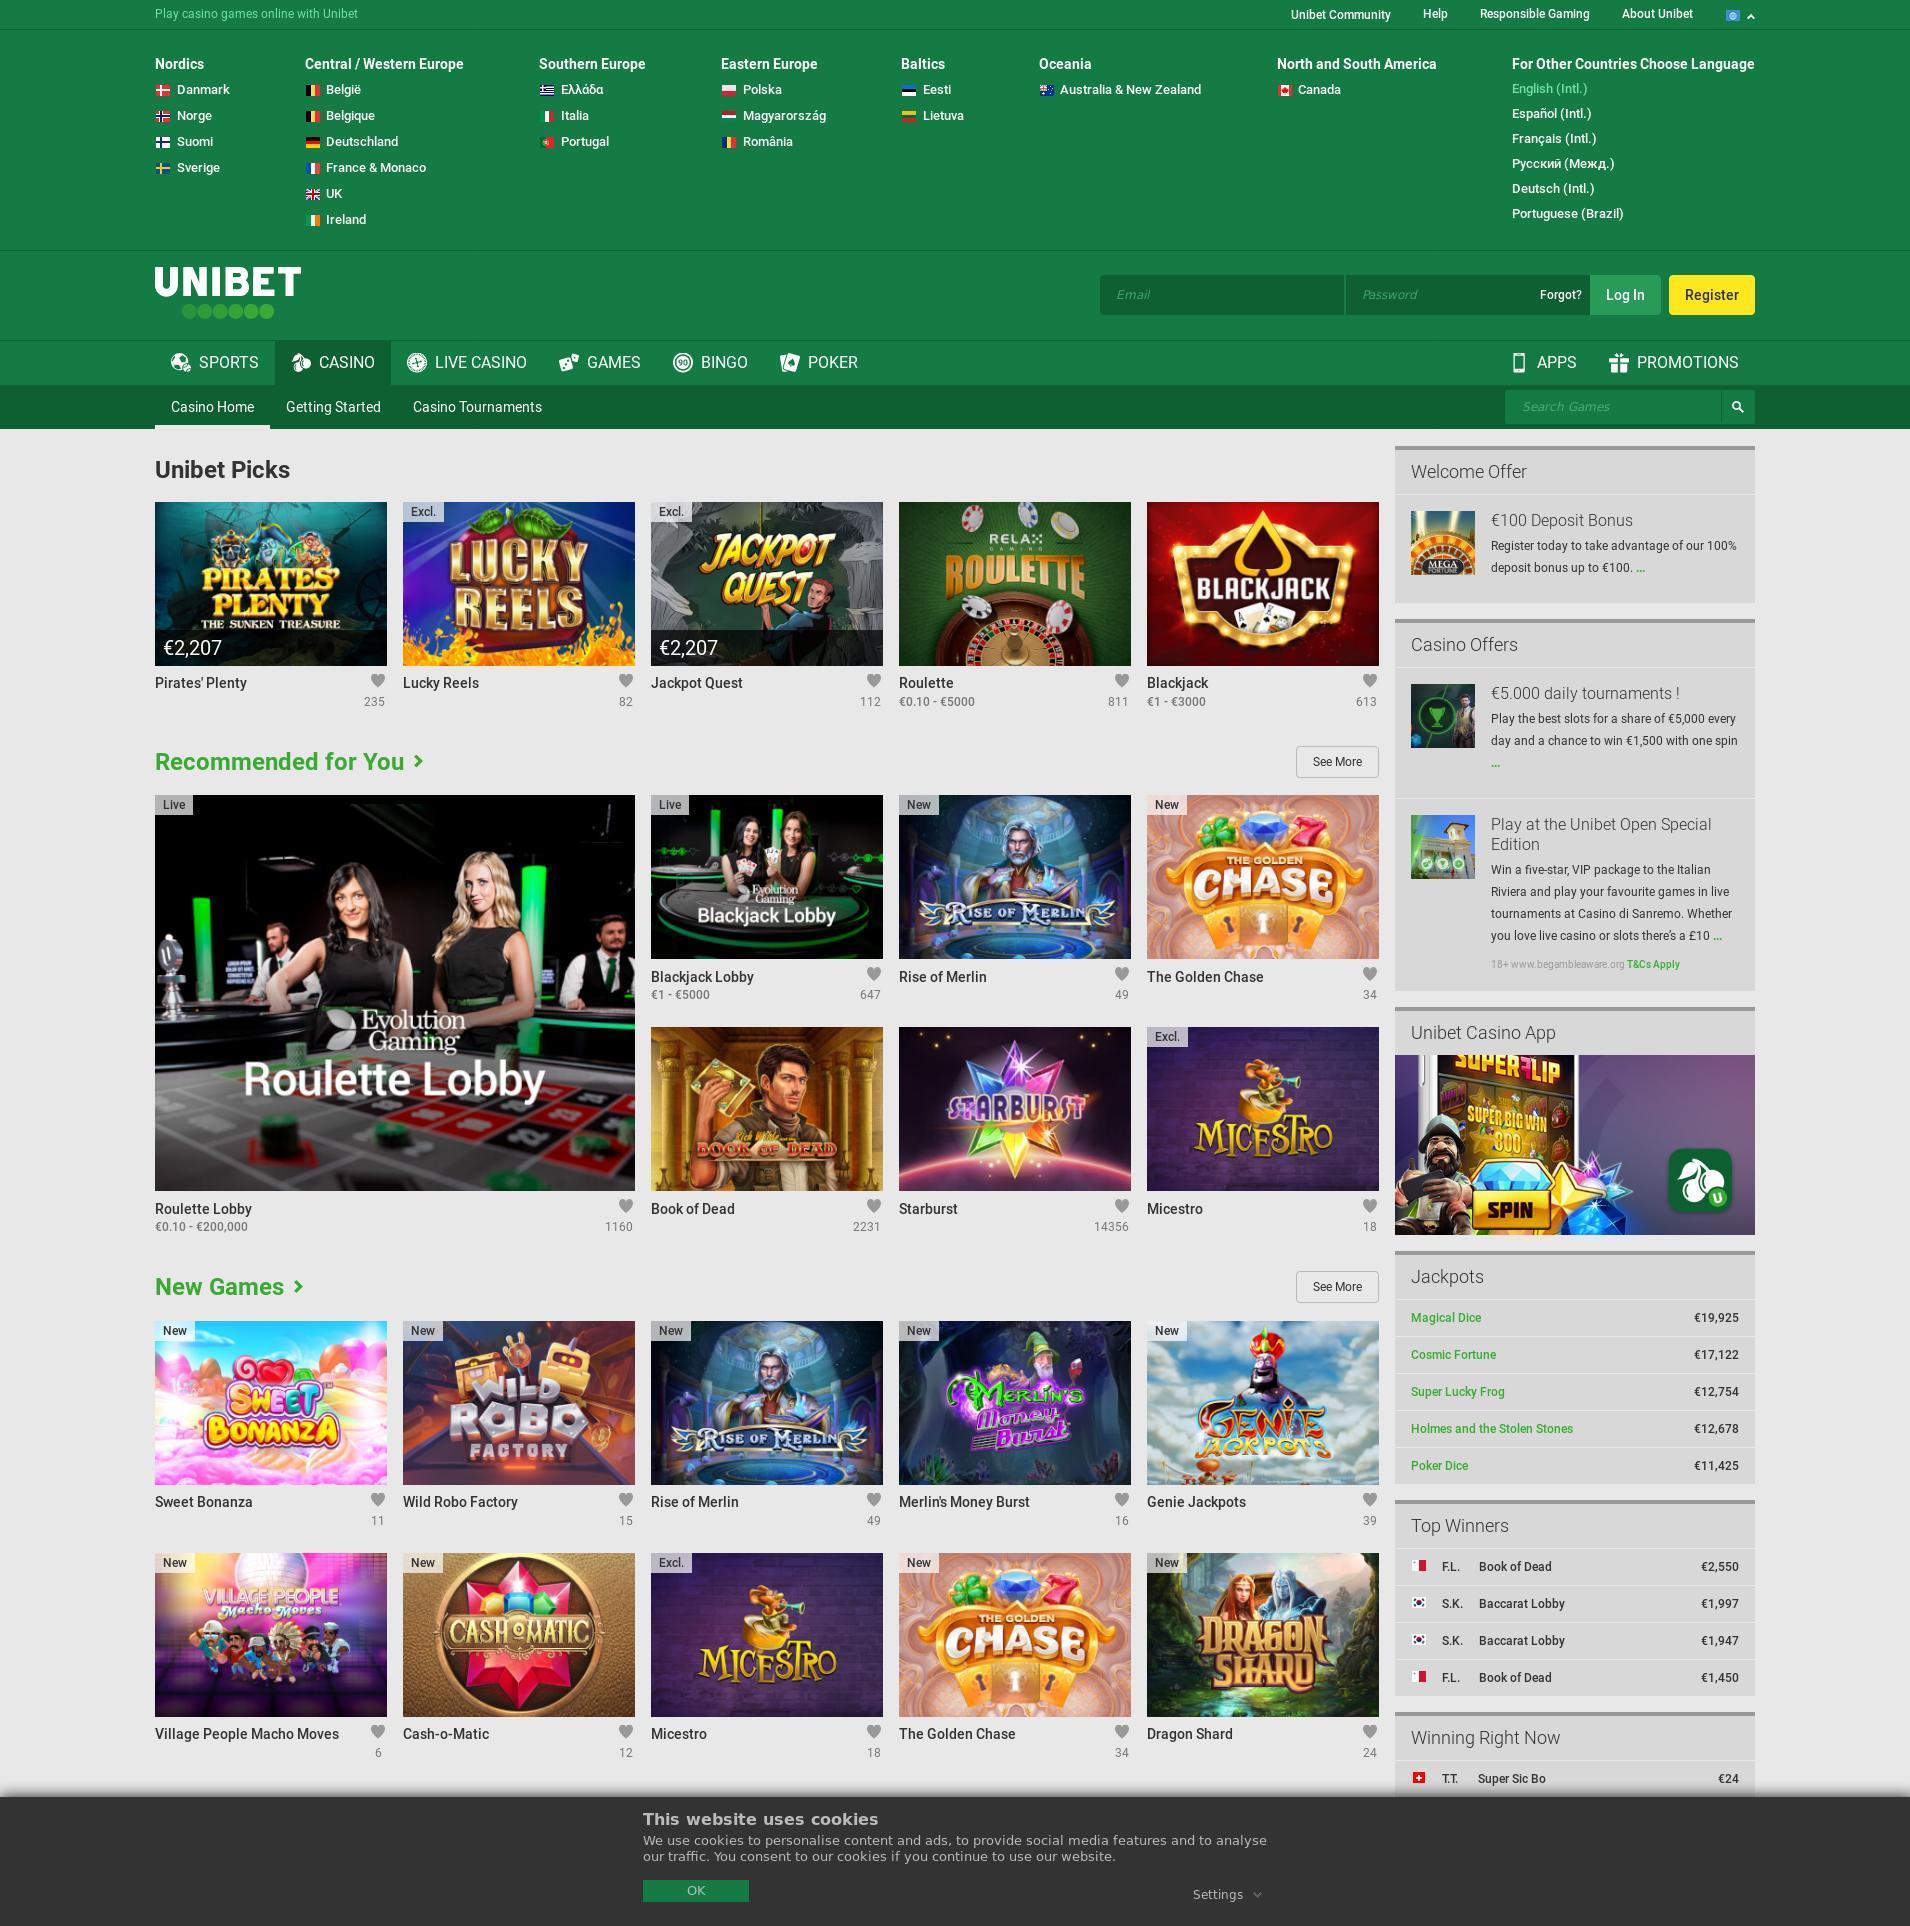 Casino screen Lobby 2019-06-26 for India